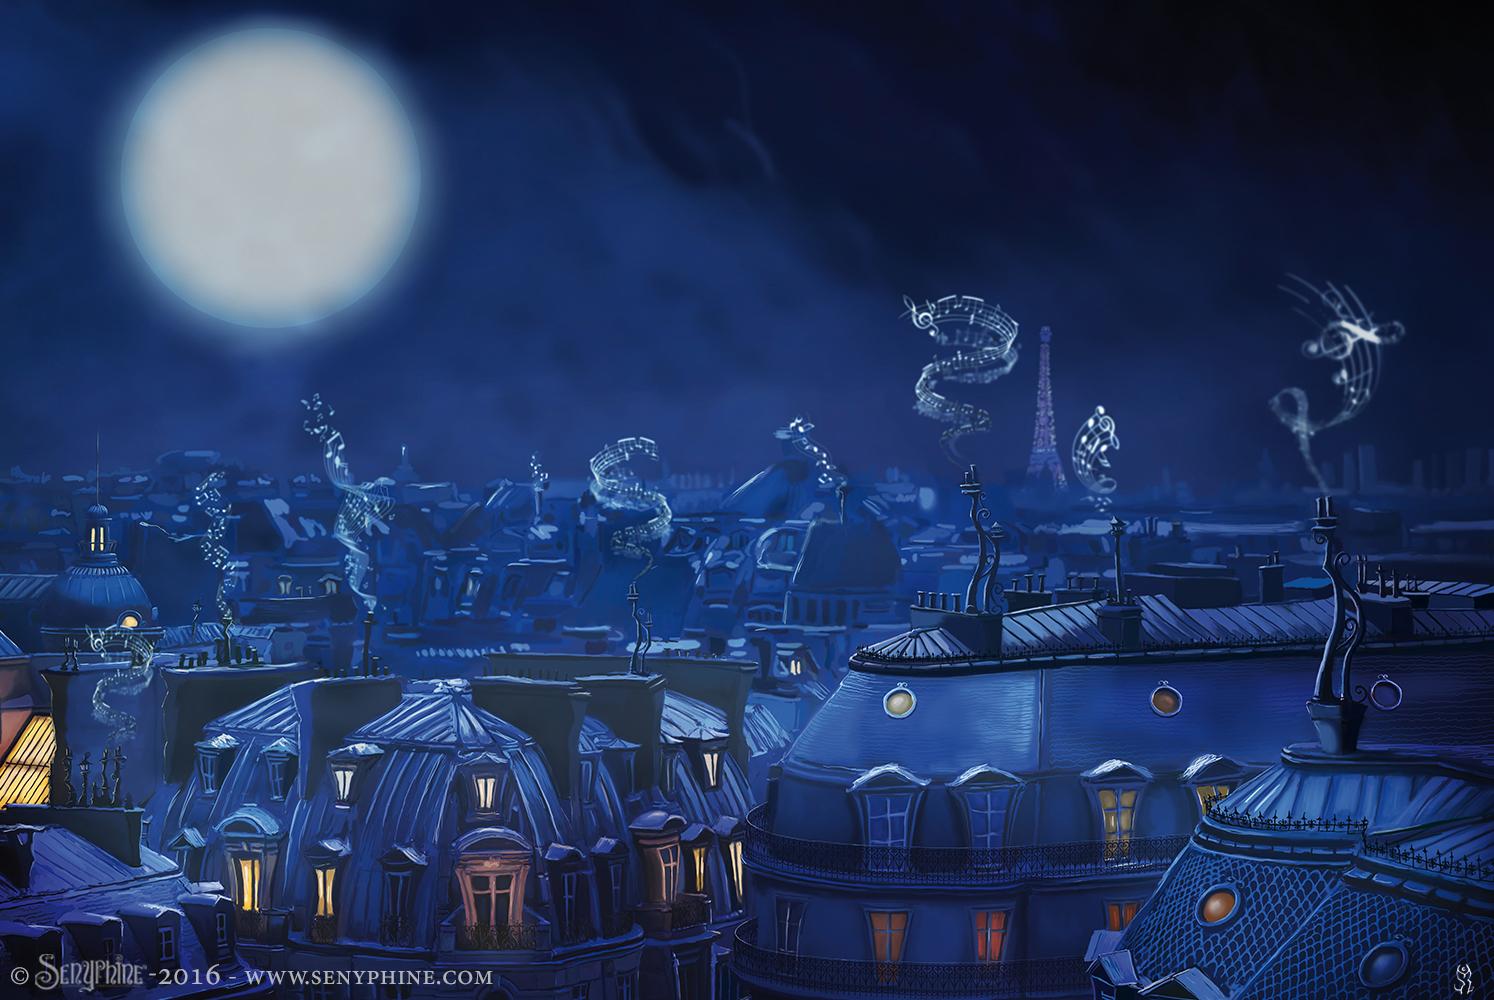 11-ville-nocturne